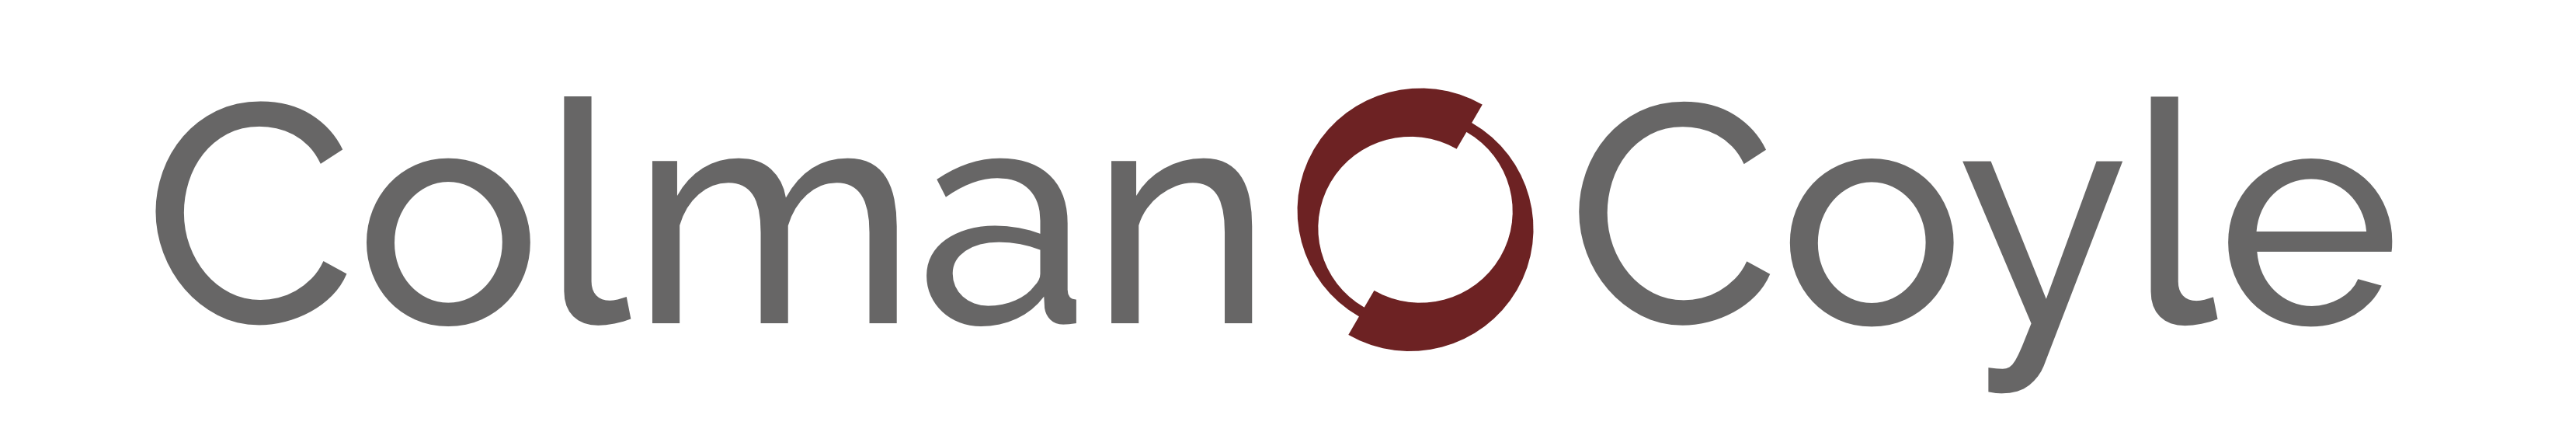 Old Logo Lower case Dark Red Grey 60 revised